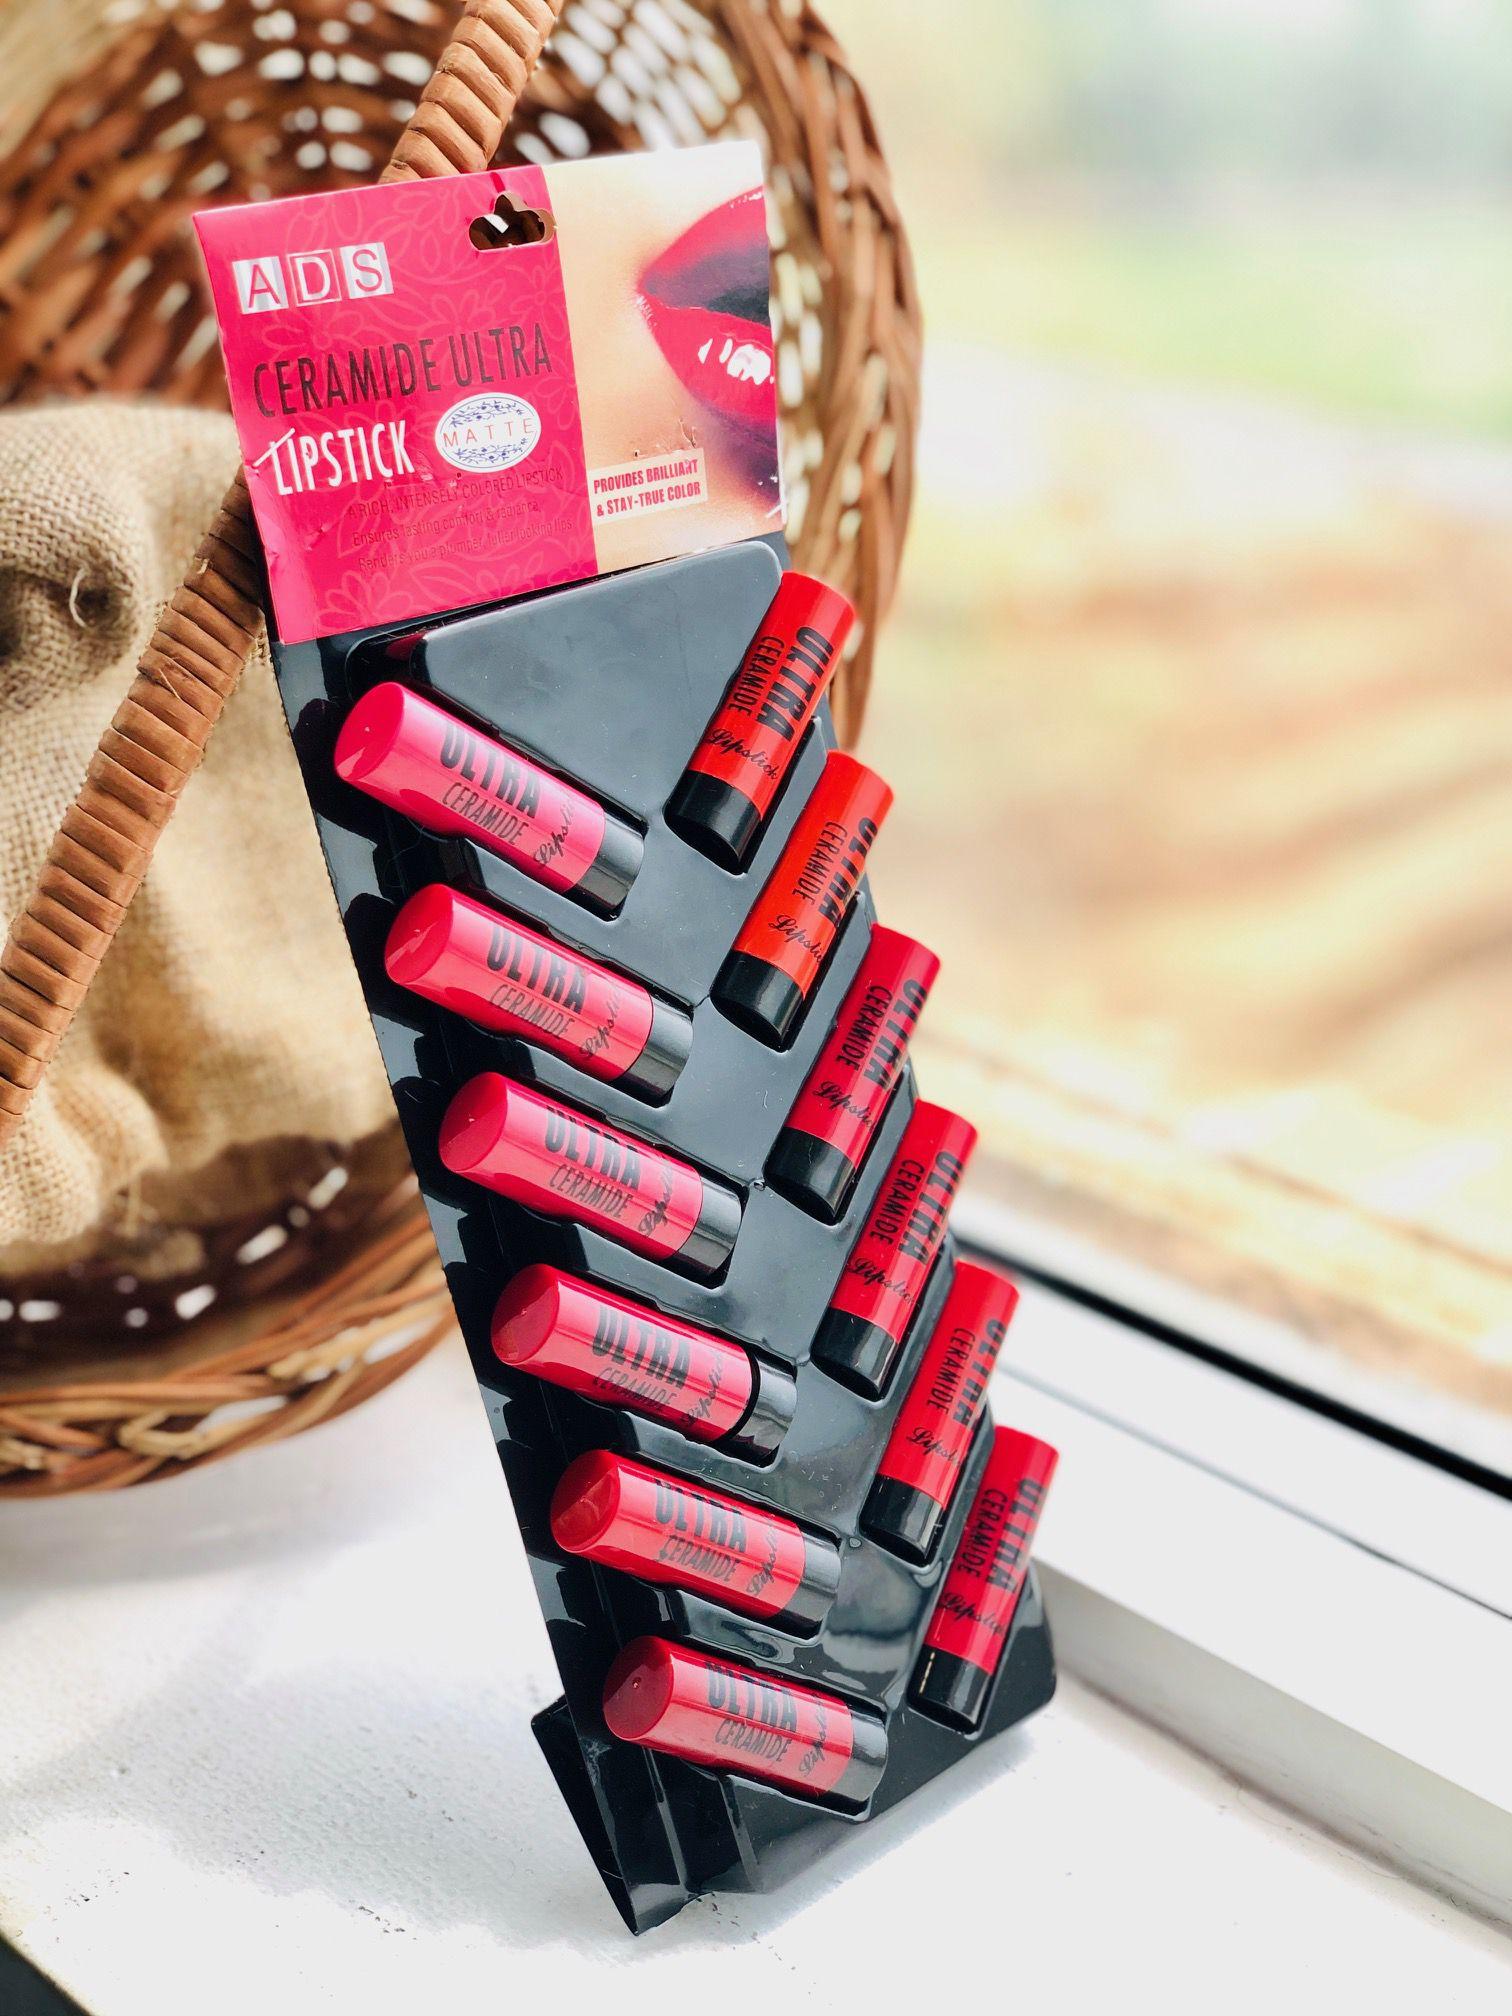 ADS Ultra Ceramide Matte Lipstick Multicolor